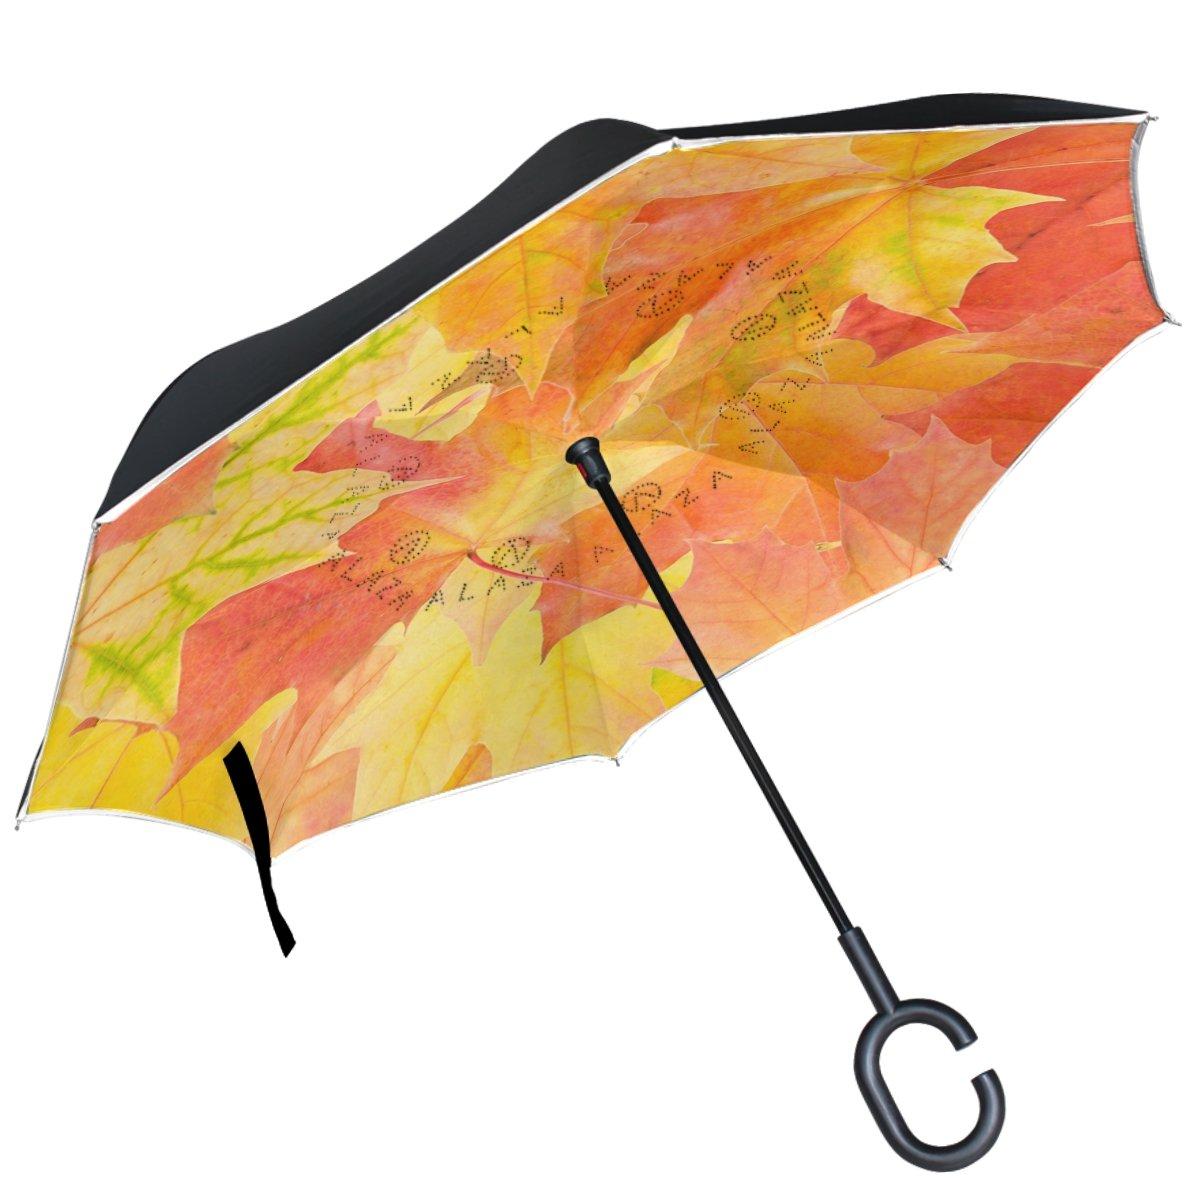 Alaza Autumn Maple Leaves FallゴールドInverted傘二層防風Reverse折り畳み傘for Car with c-shapeハンドル   B076X1KDGR